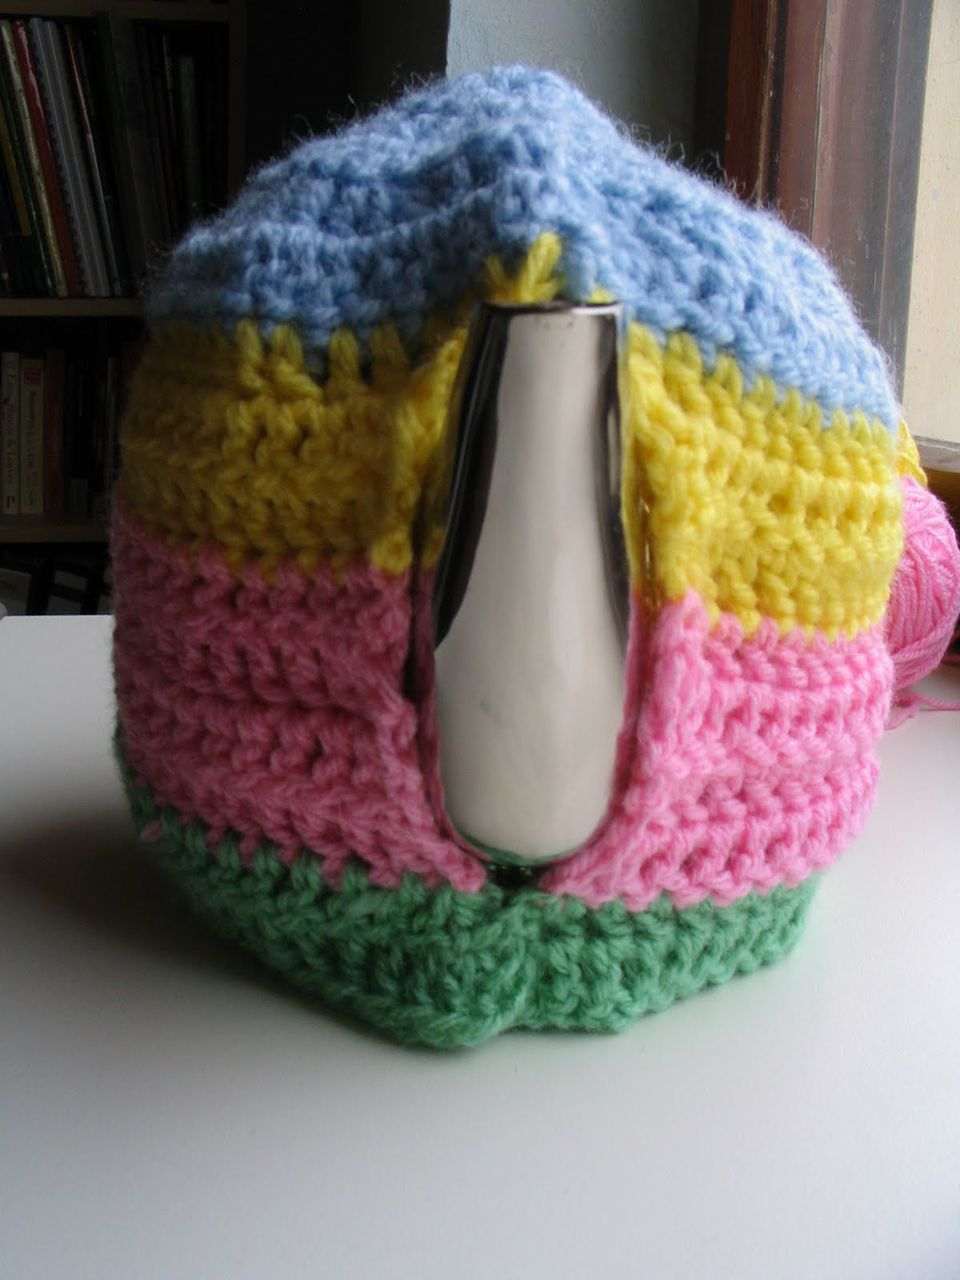 14 free tea cozy crochet patterns straightforward tea cozy free crochet pattern bankloansurffo Choice Image